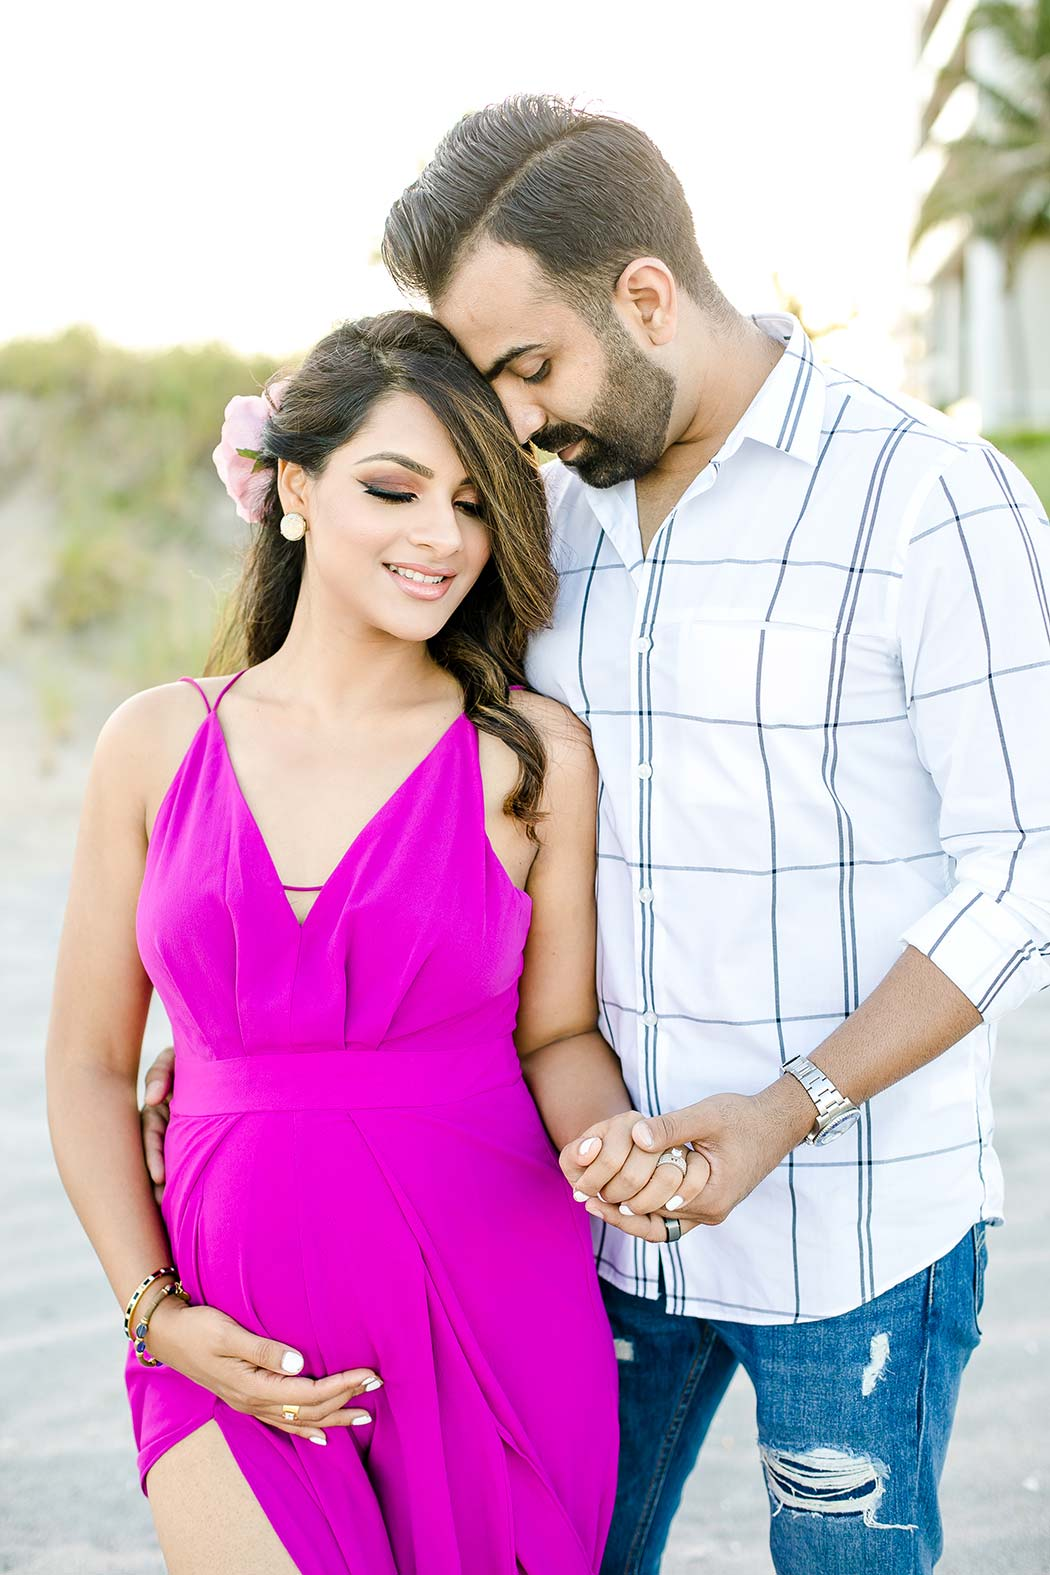 boca raton beach maternity photoshoot with couple   pink maternity dress